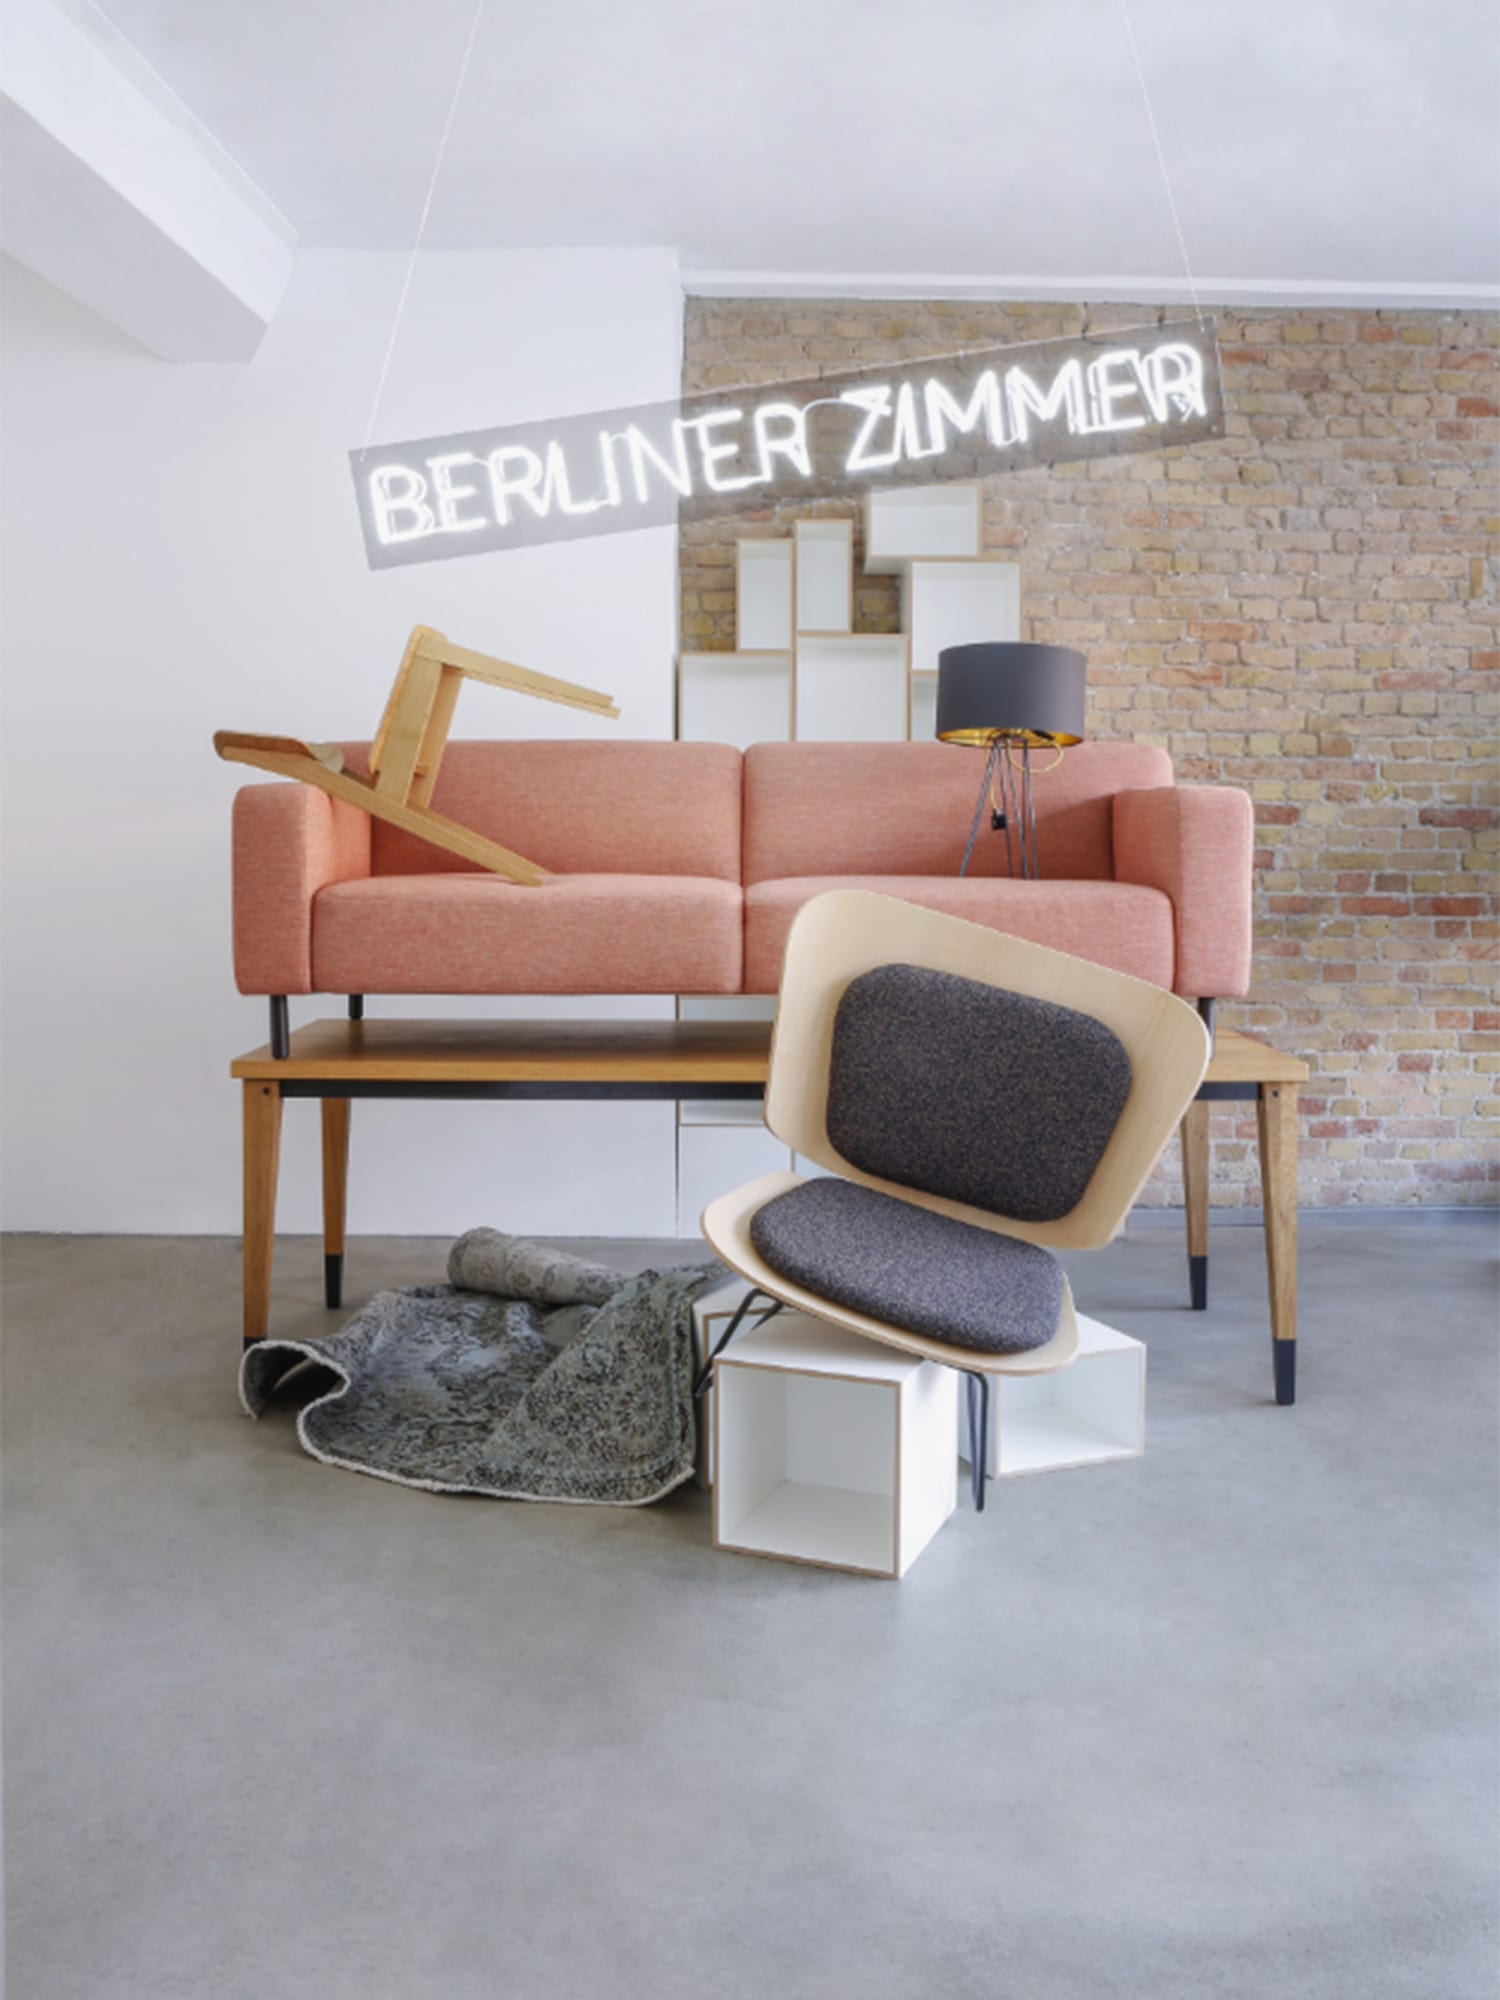 berliner zimmer – pop-up-store in münchen - ad